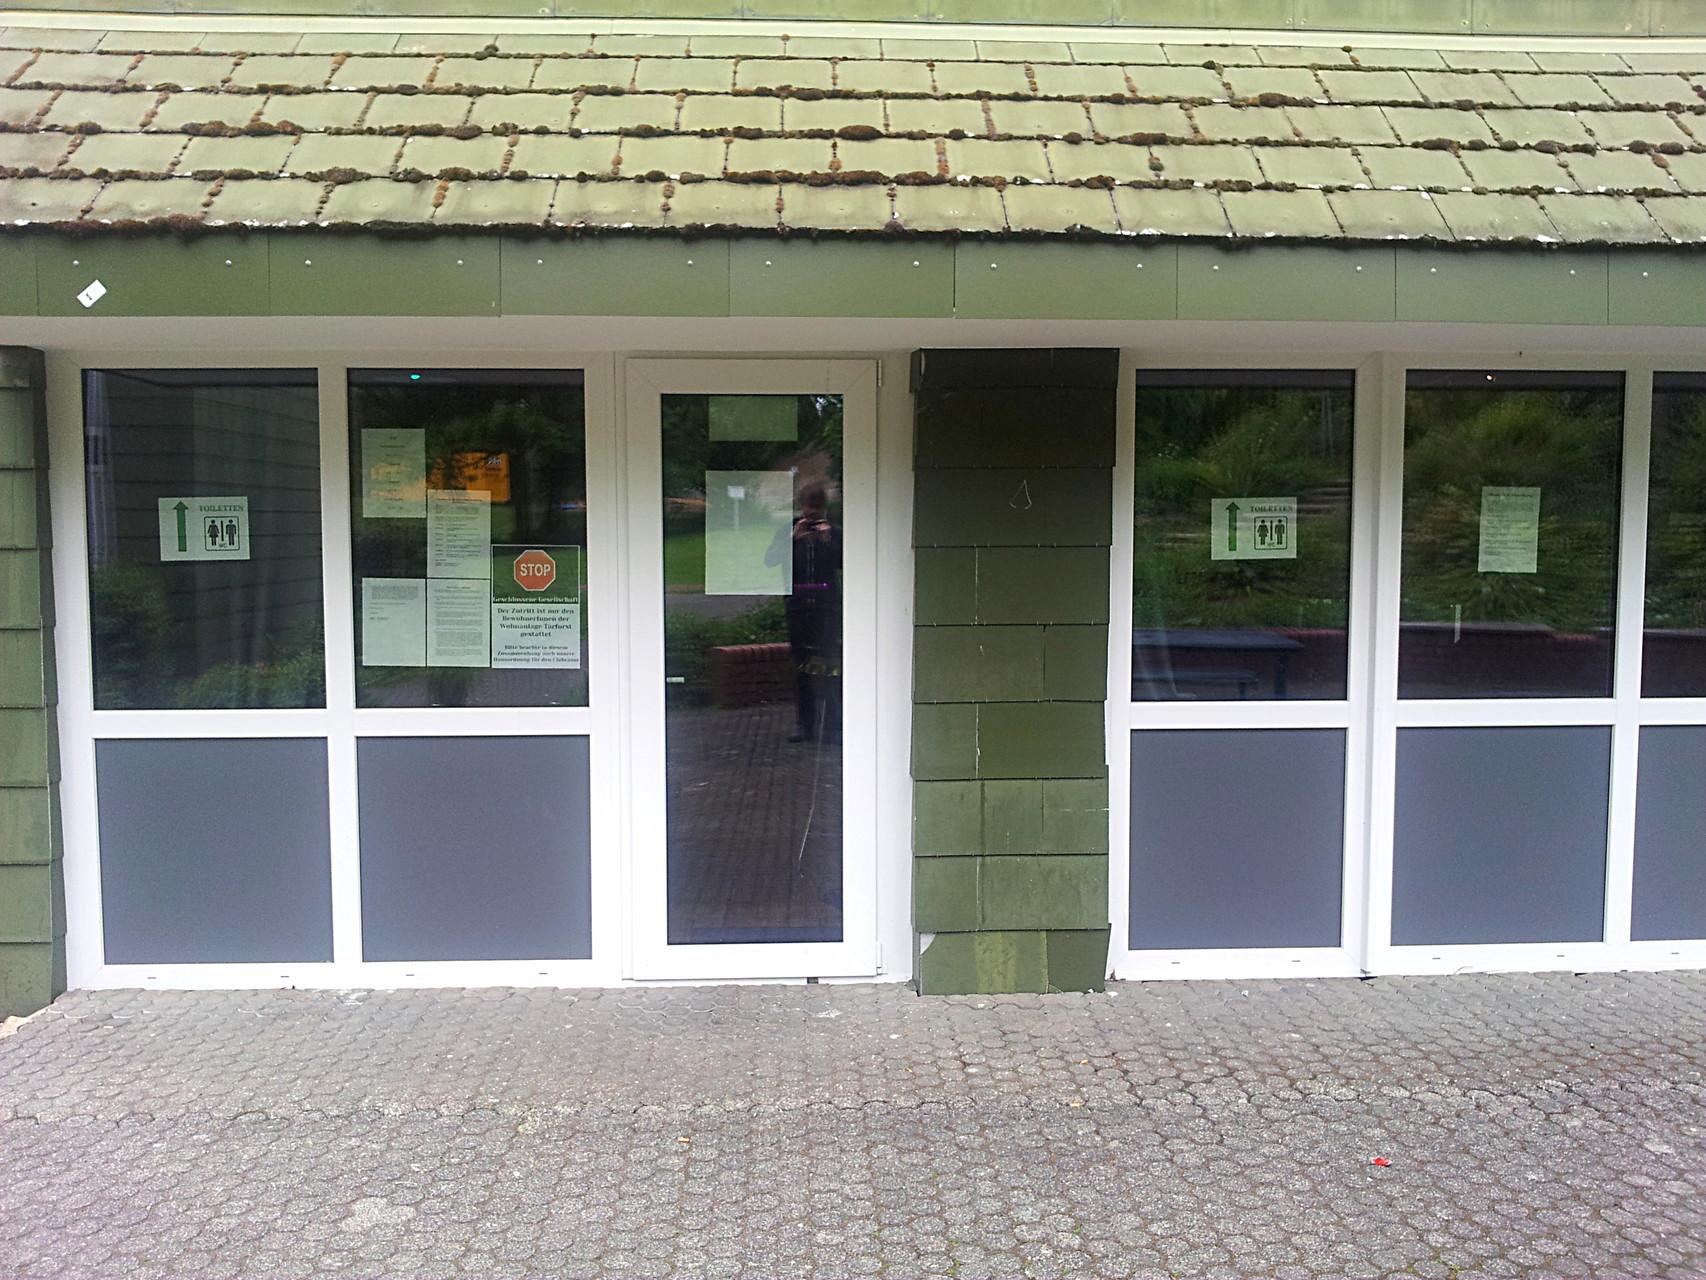 Clubraum in Haus 8 - Eingang